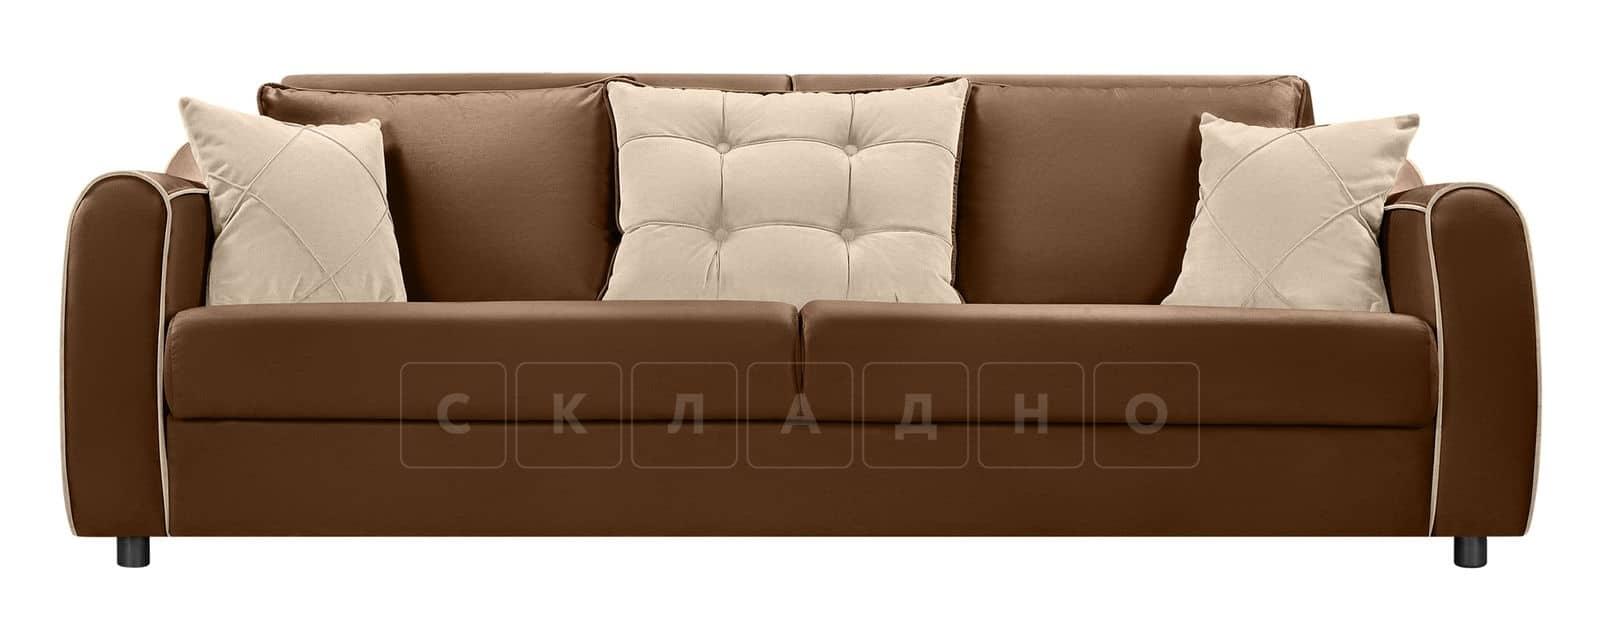 Диван Флэтфорд велюр коричневый фото 2 | интернет-магазин Складно